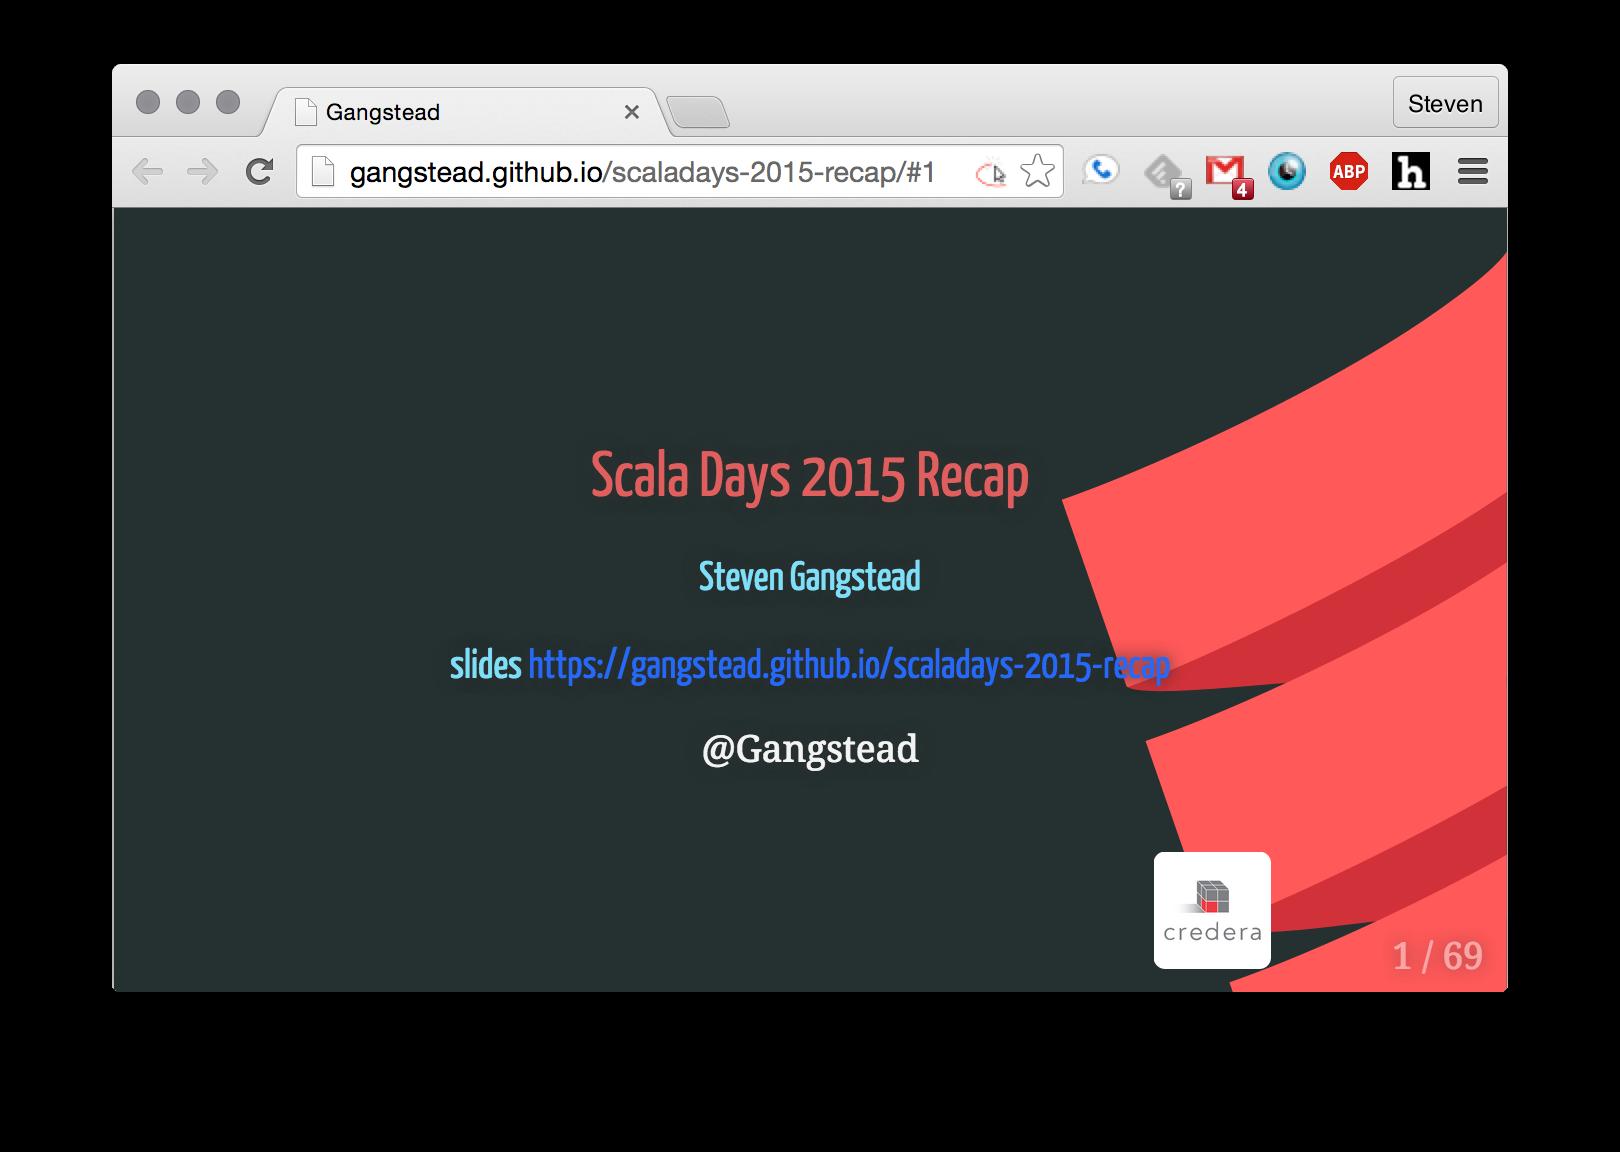 scala-days-2015-recap